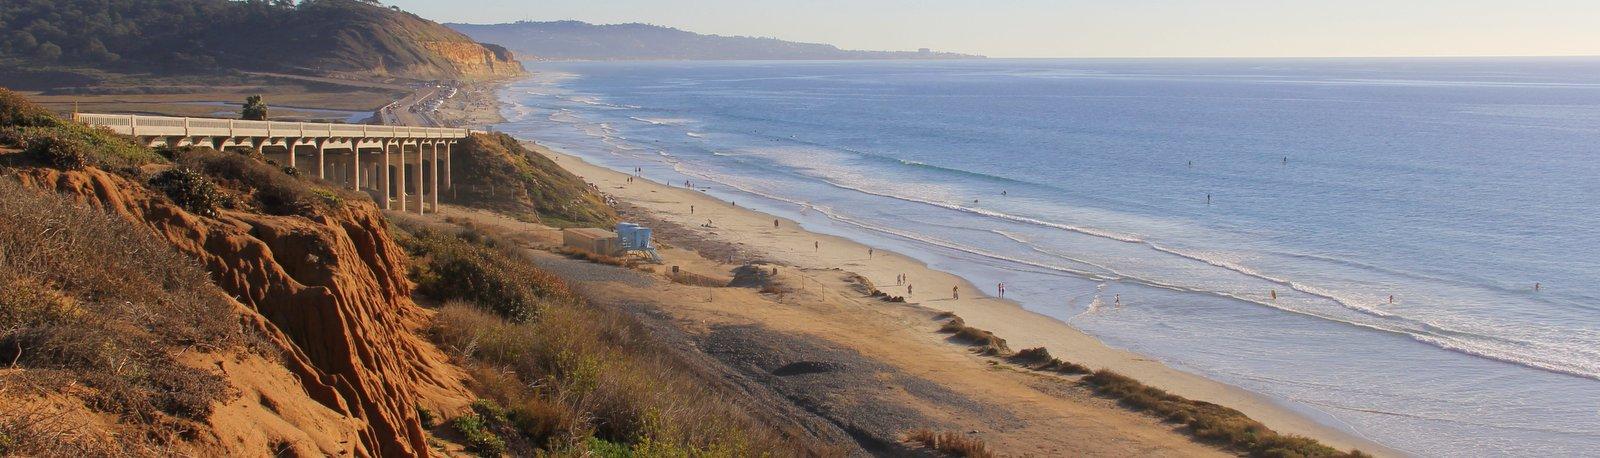 San_Diego_California_photo_2736